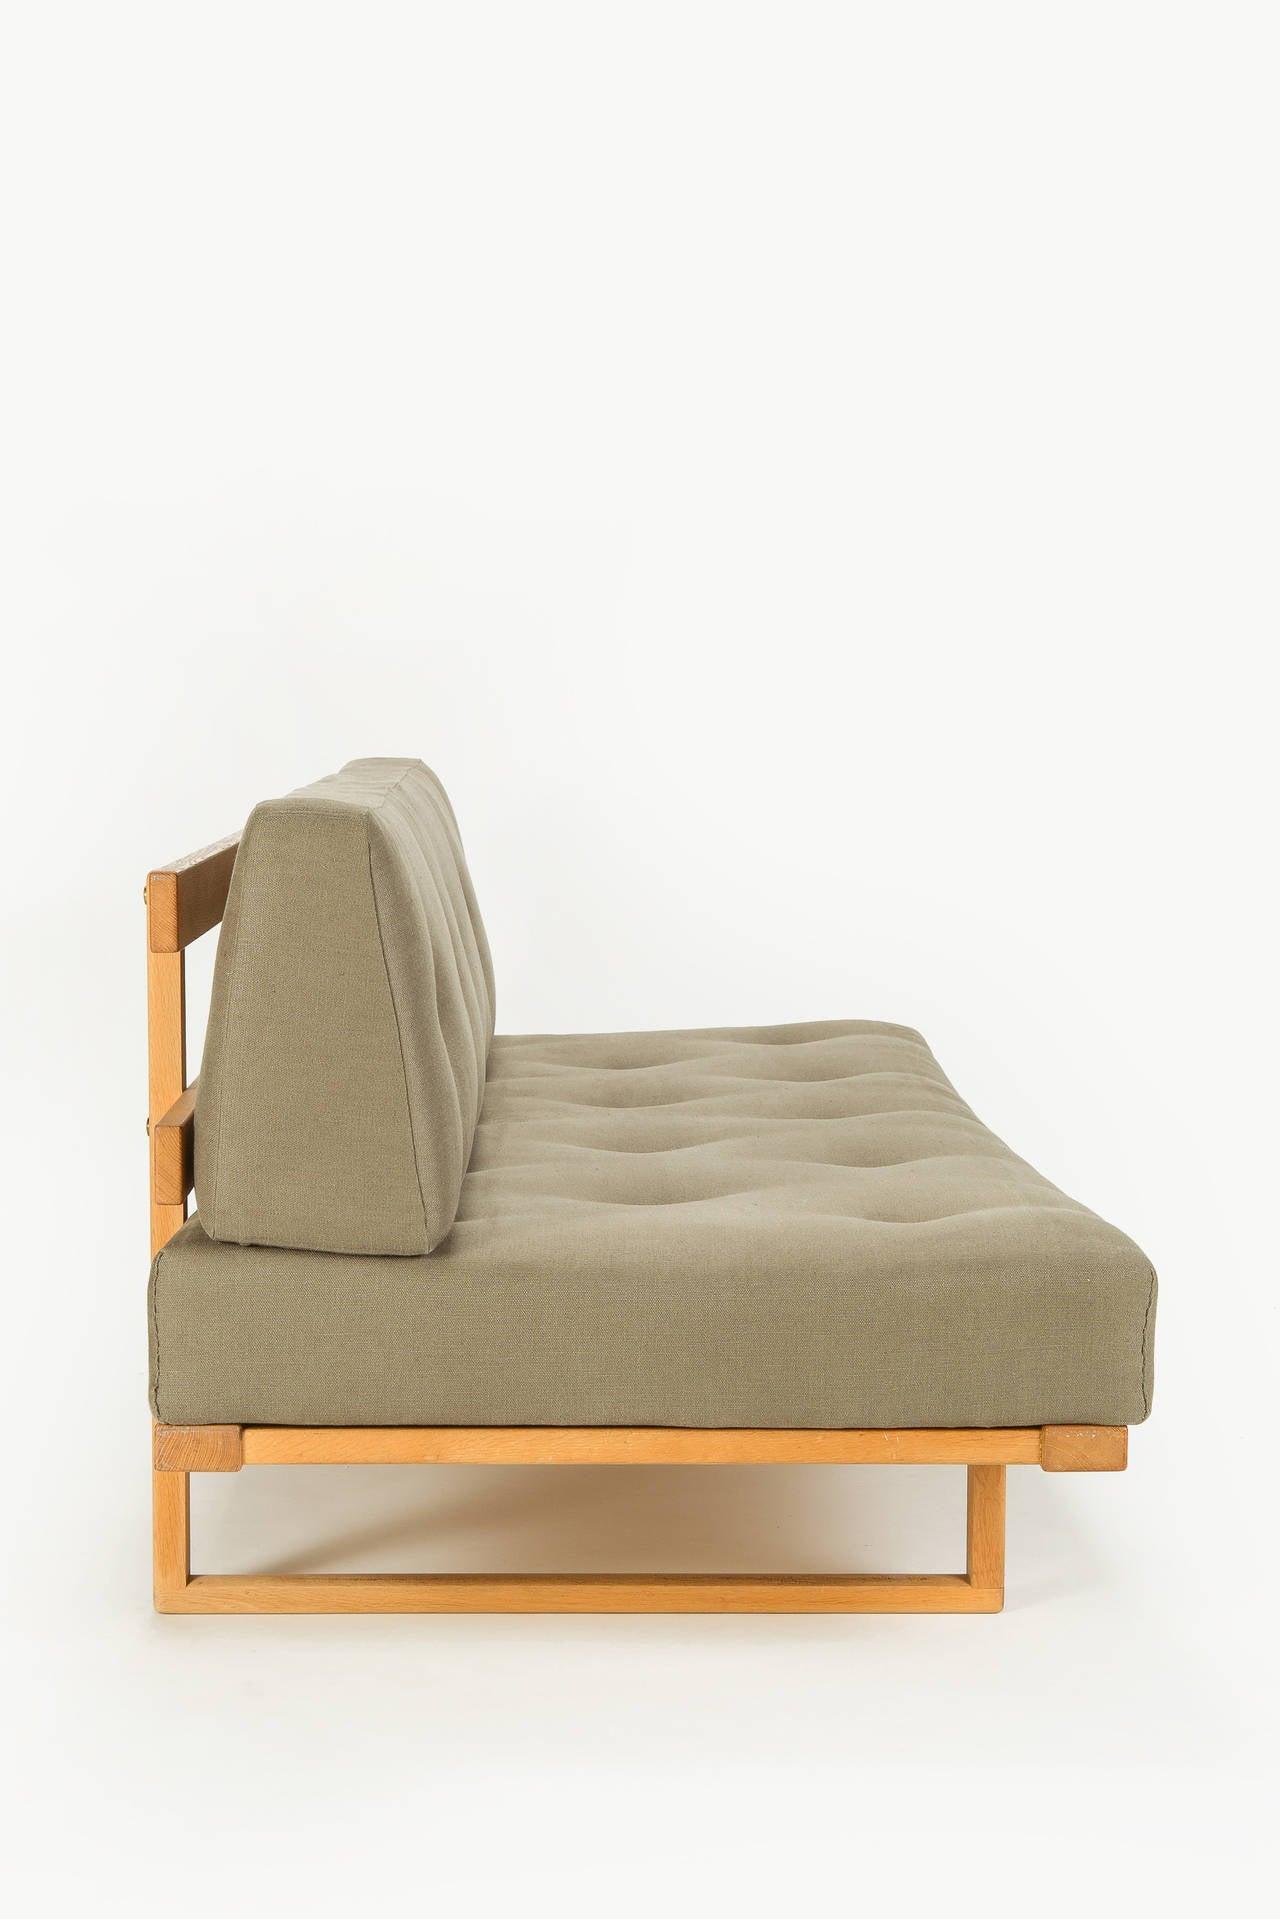 Danish Oak Sofa Daybed by Borge Mogensen for Fredericia